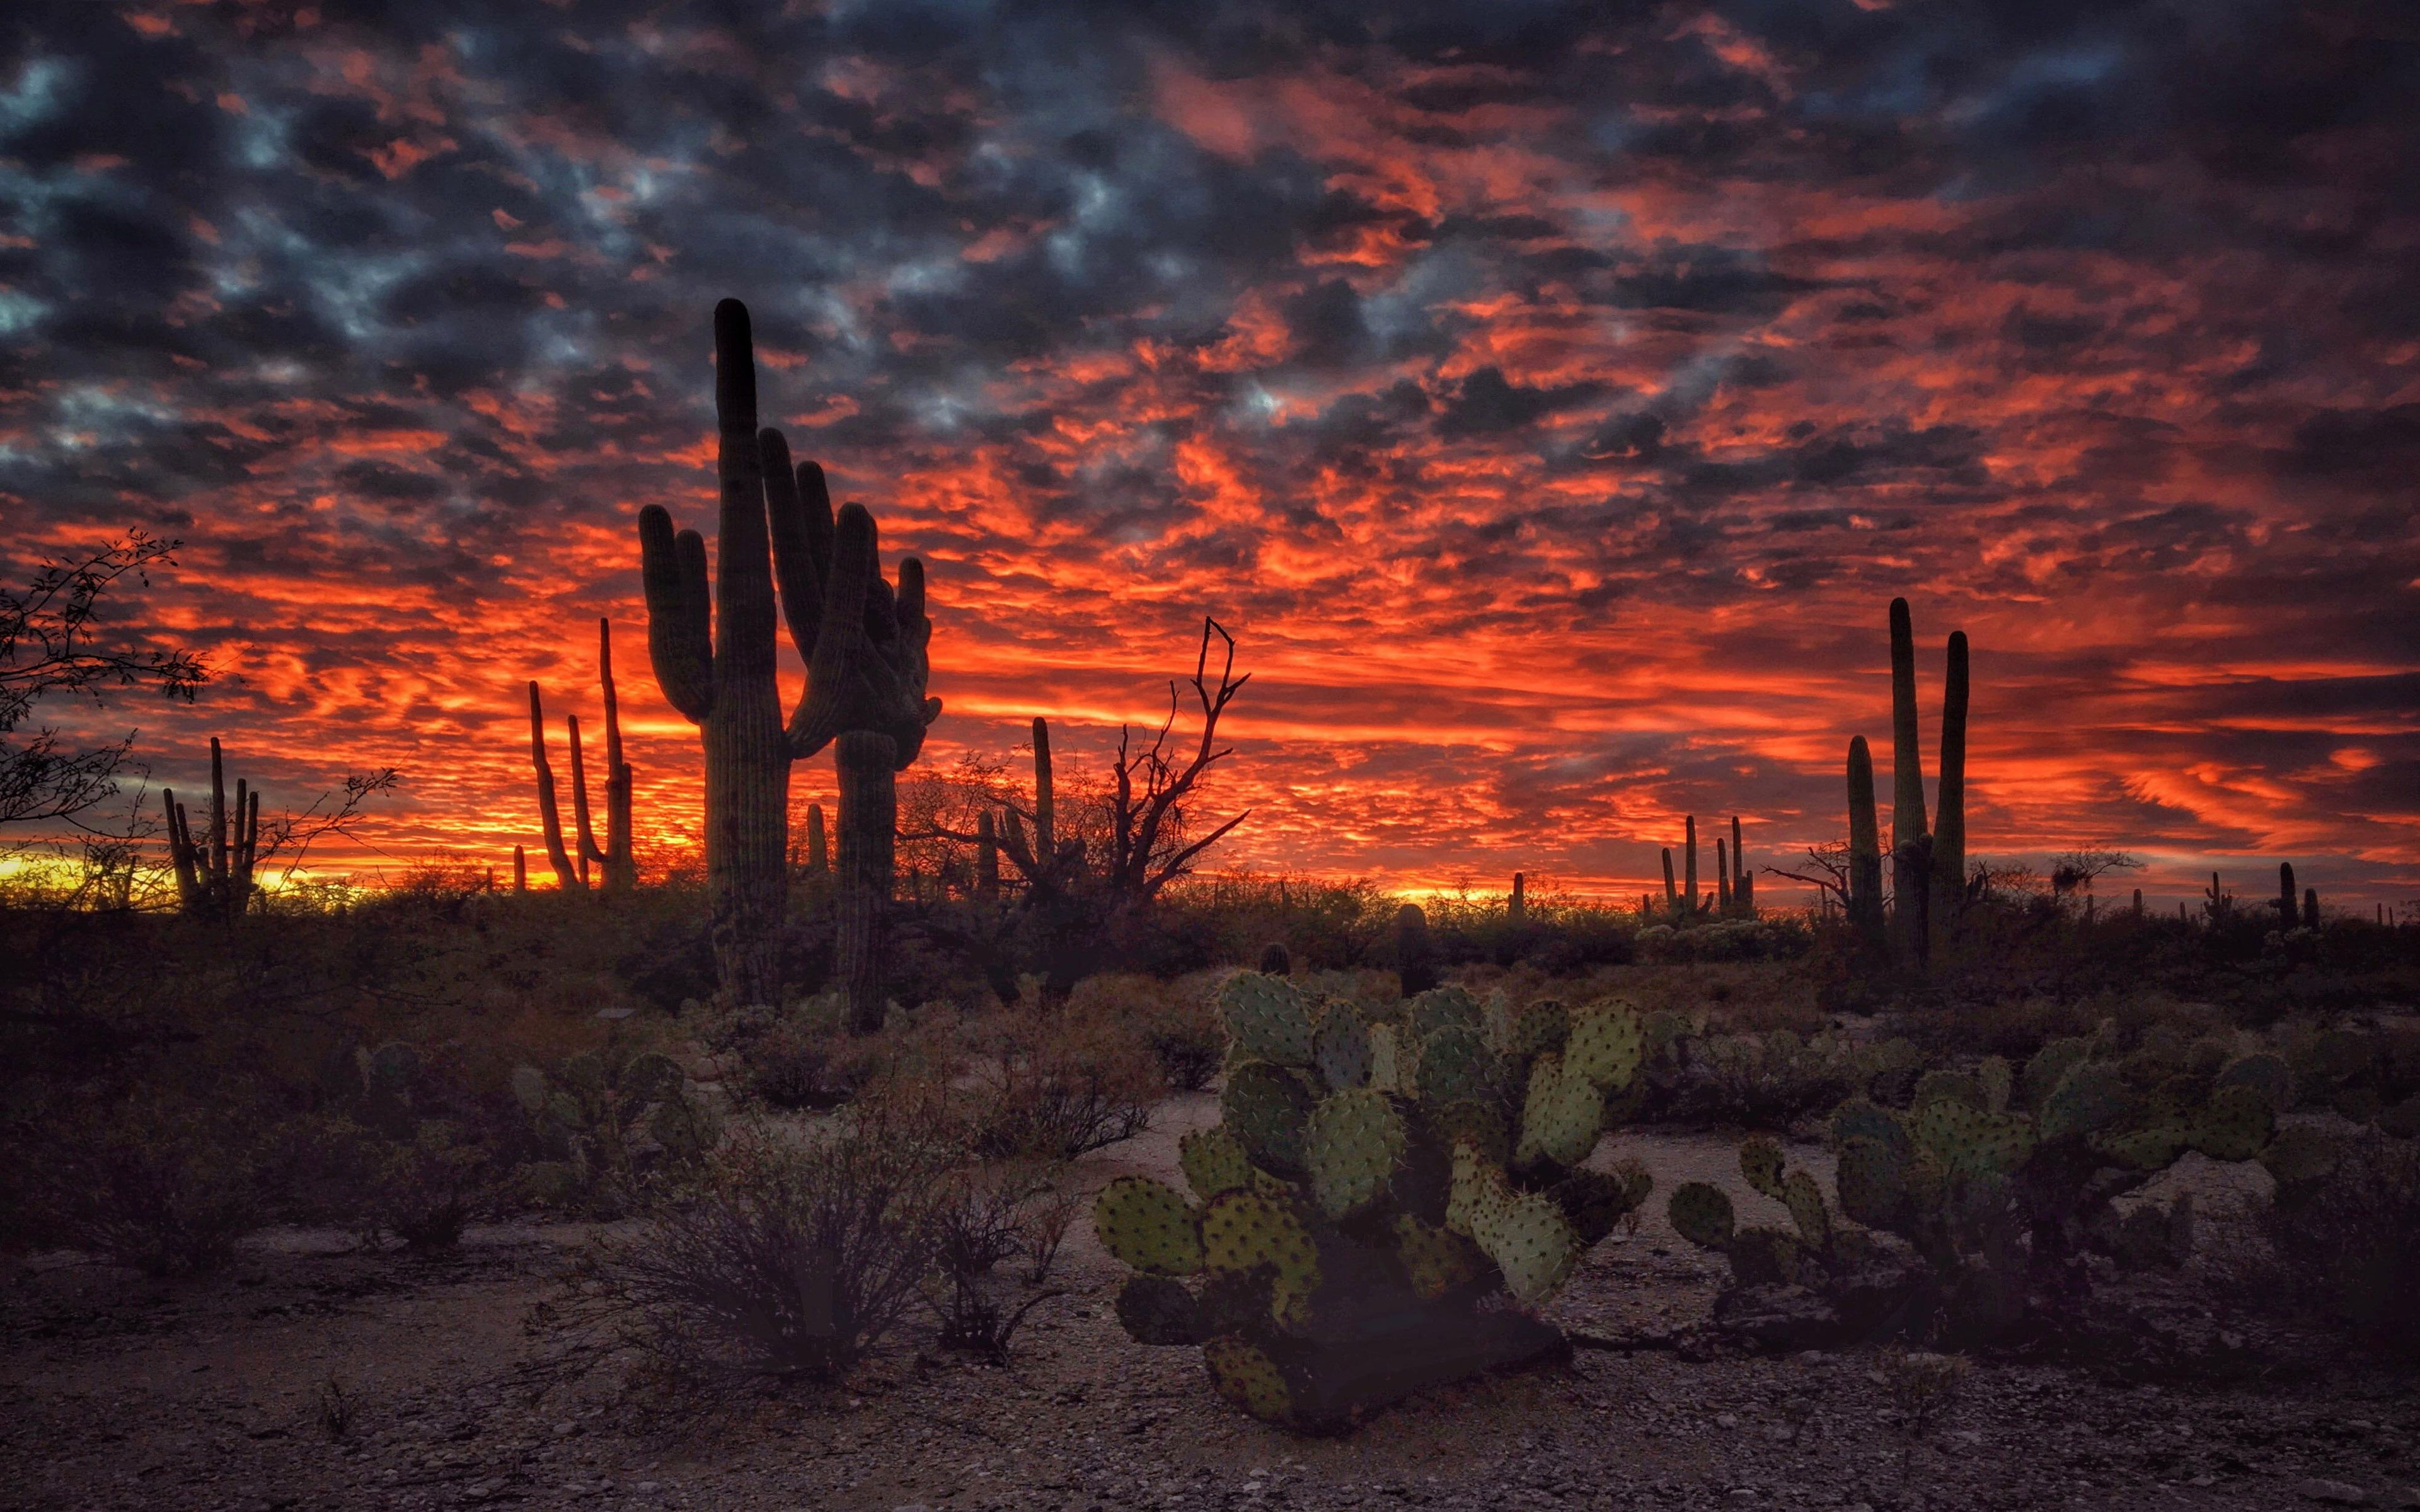 Tucson Arizona Sunset Flaming Sky Desert Landscape With Cactus Desktop Hd Wallpapers Landscape Wallpaper Wallpaper Nature Flowers Beautiful Landscape Wallpaper Hd wallpaper cacti evening sunset desert